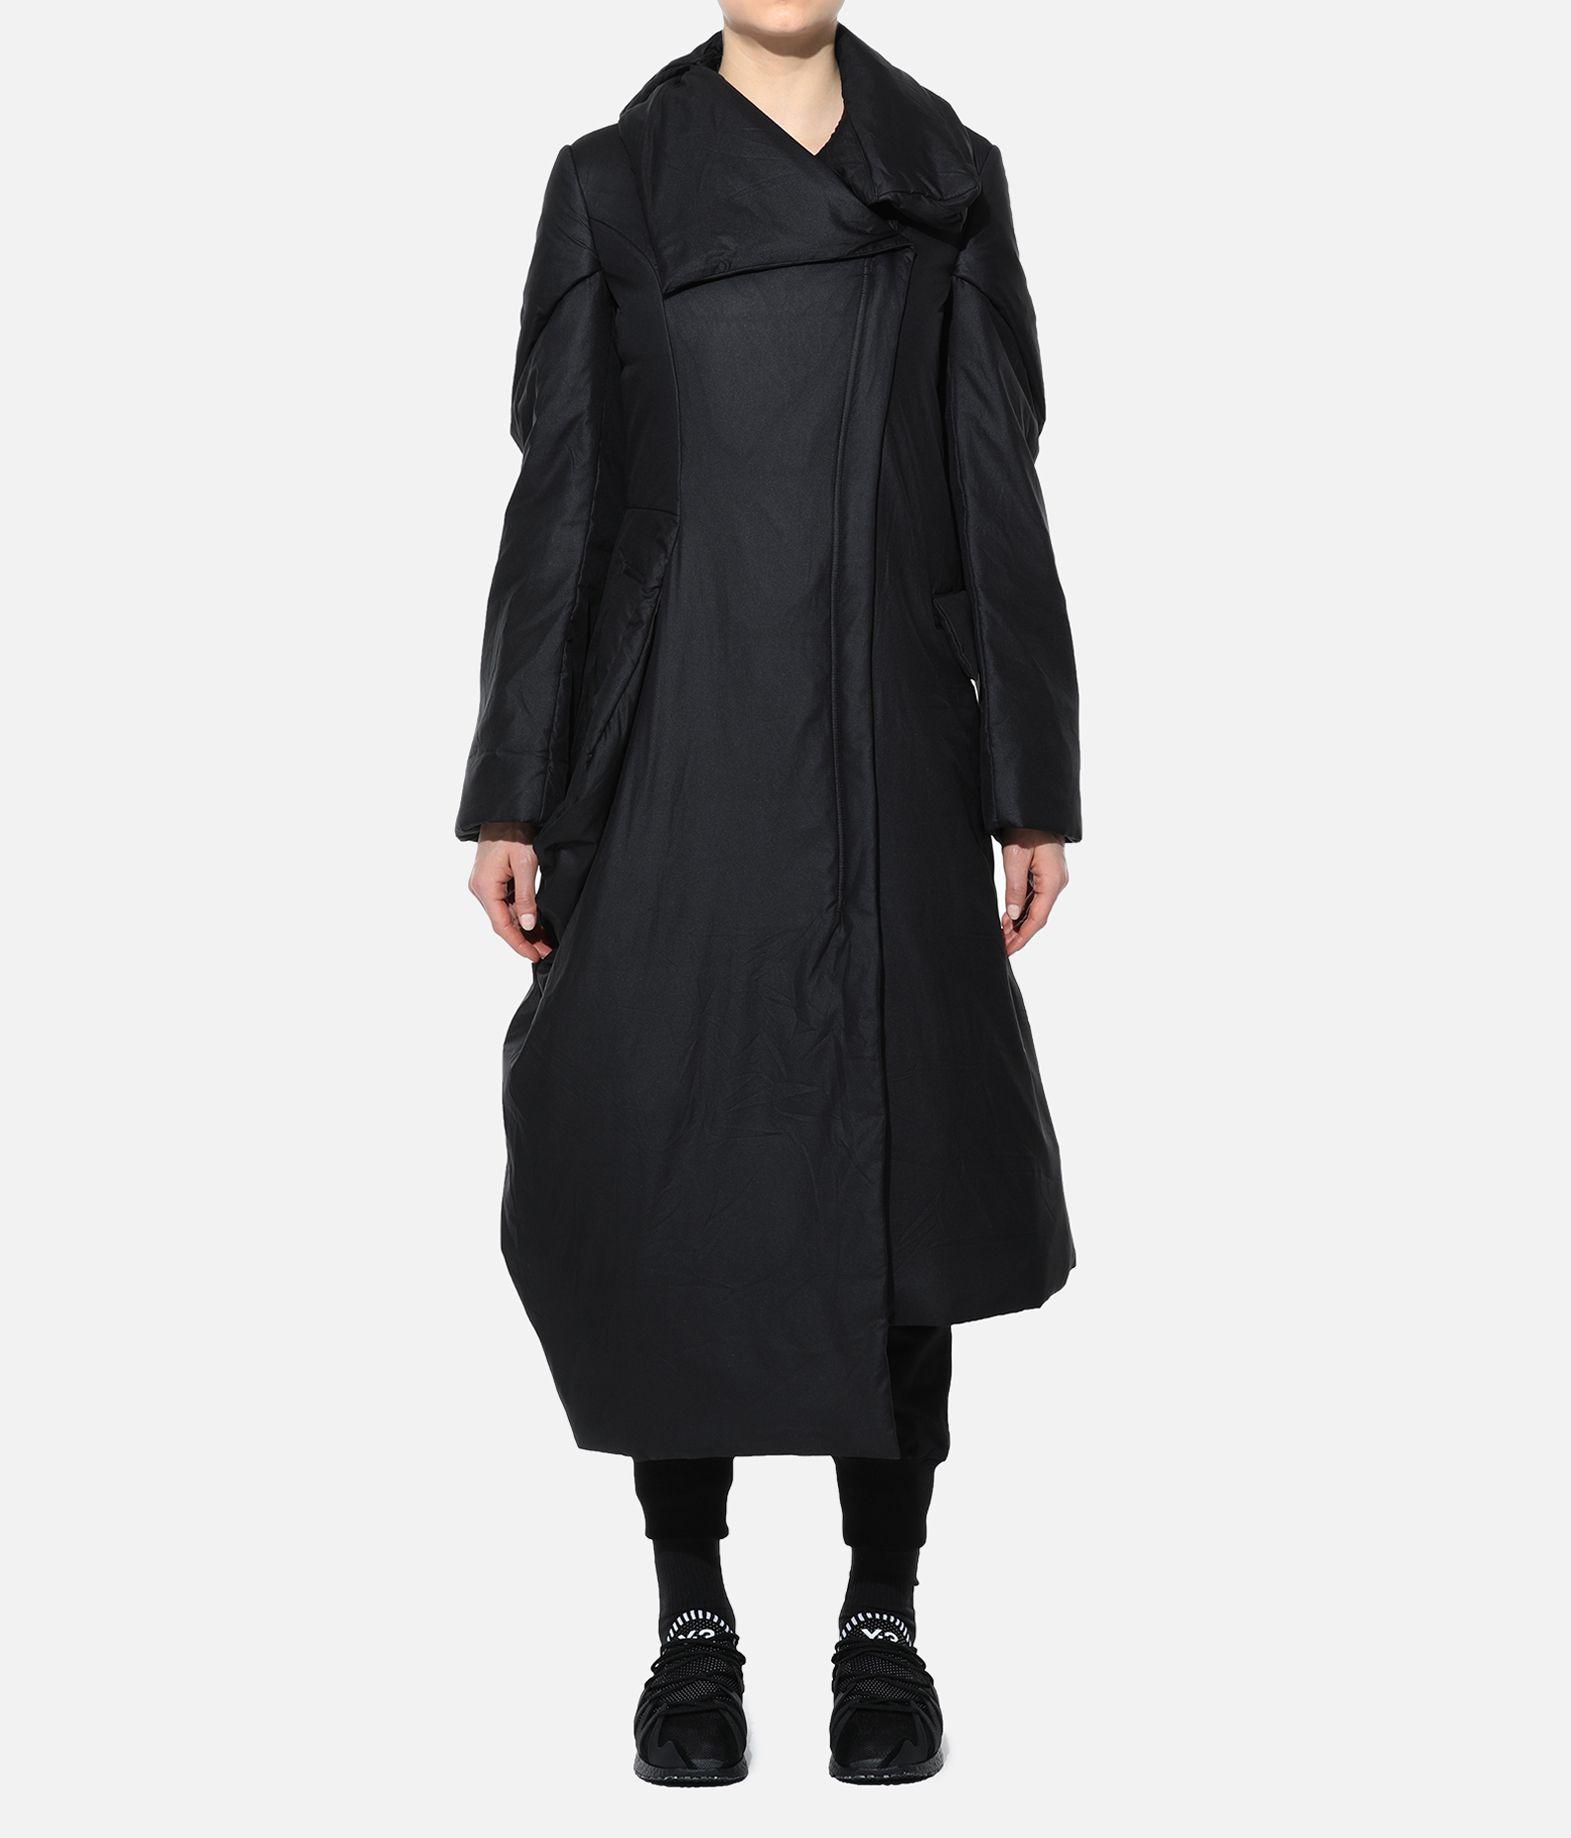 Y-3 Y-3 Adizero Padded Coat Куртка Для Женщин r